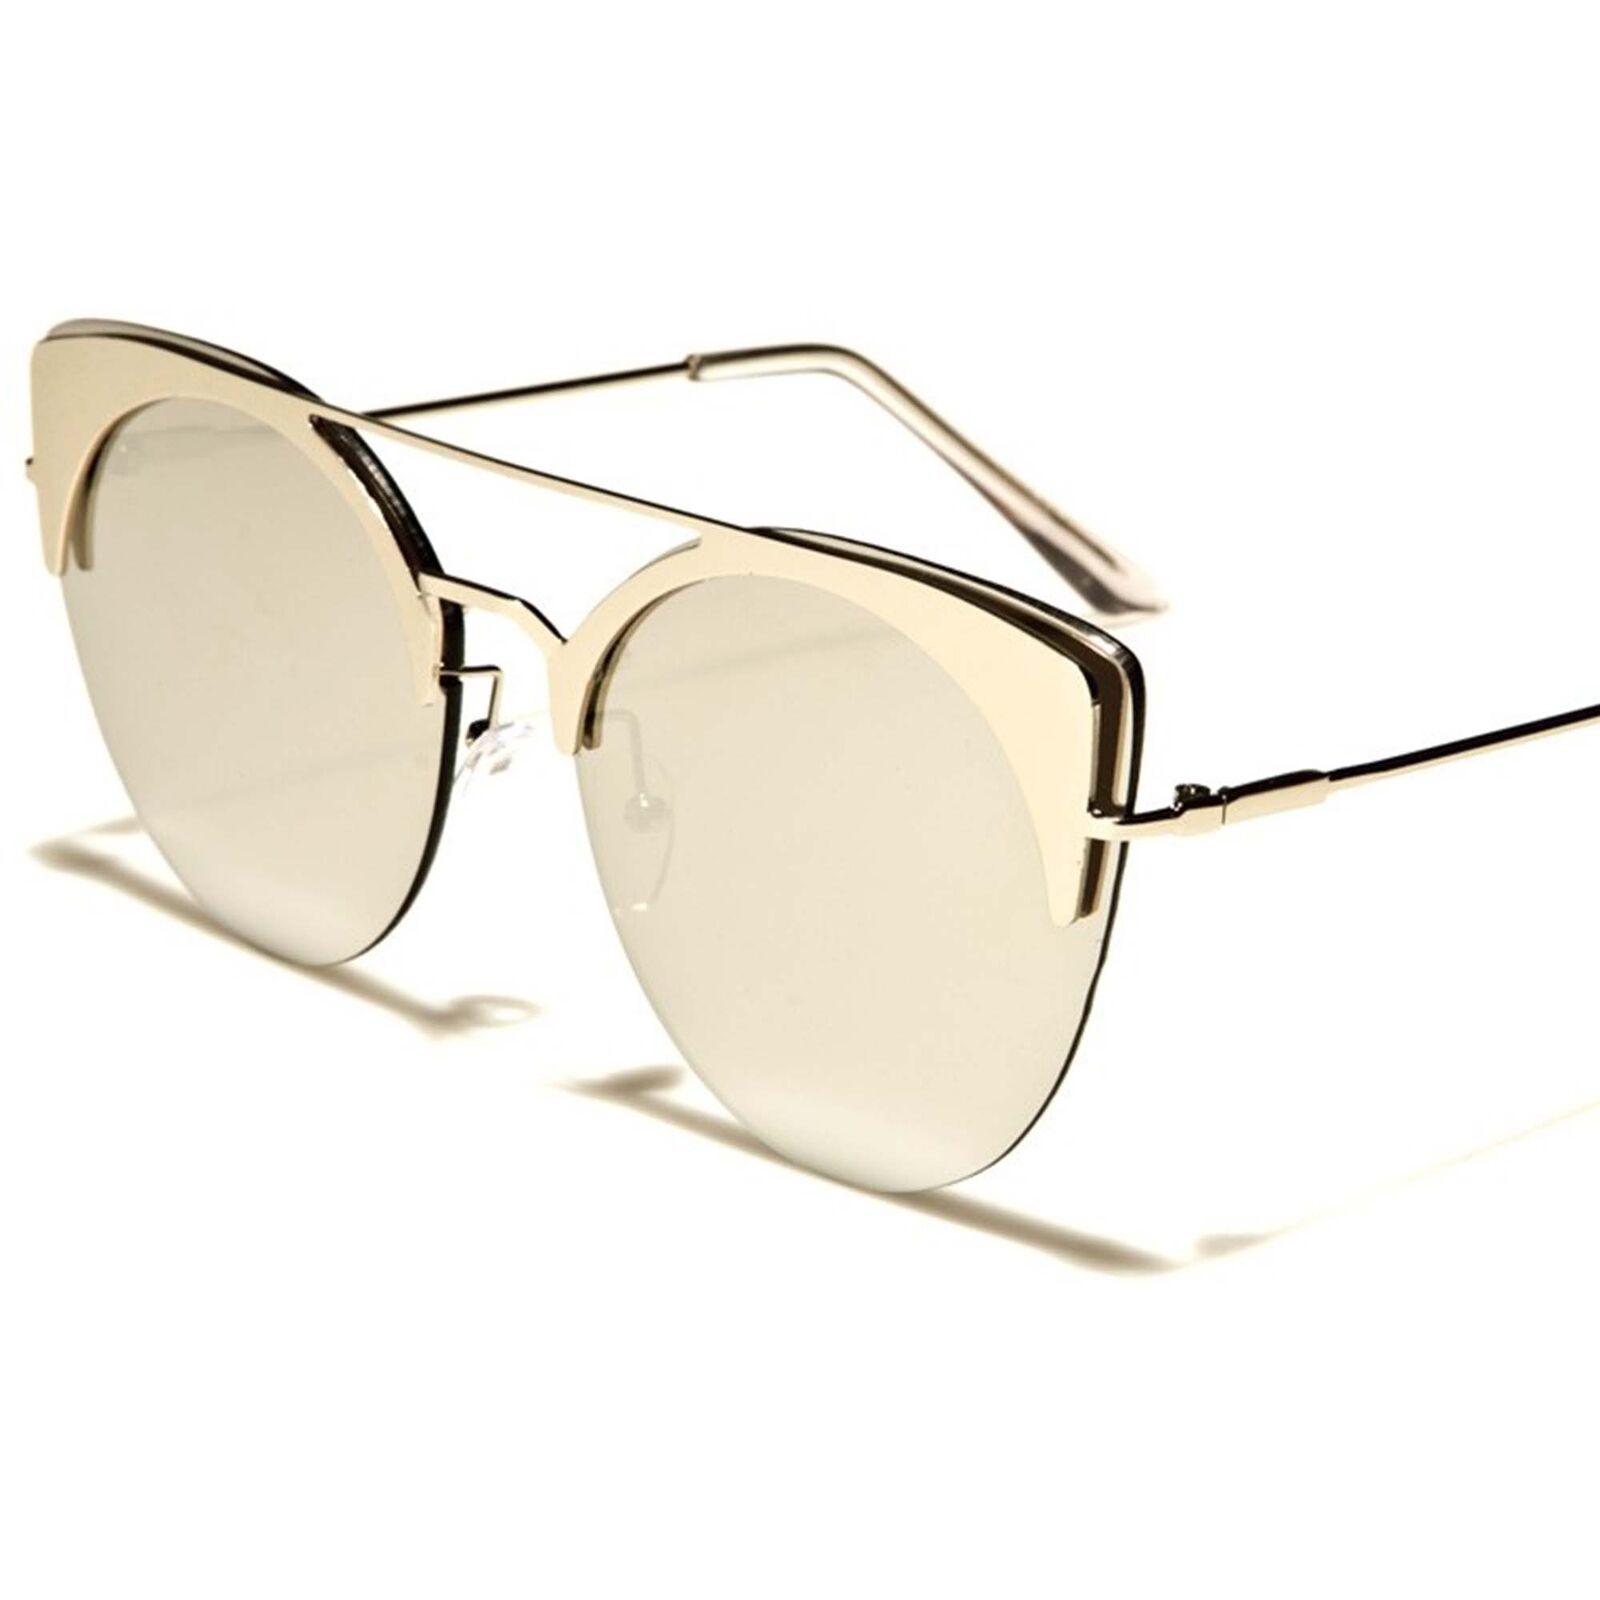 Celebrity Fashion Elegant Chic Designer Chrome Mirrored Lens Cat Eye Sunglasses